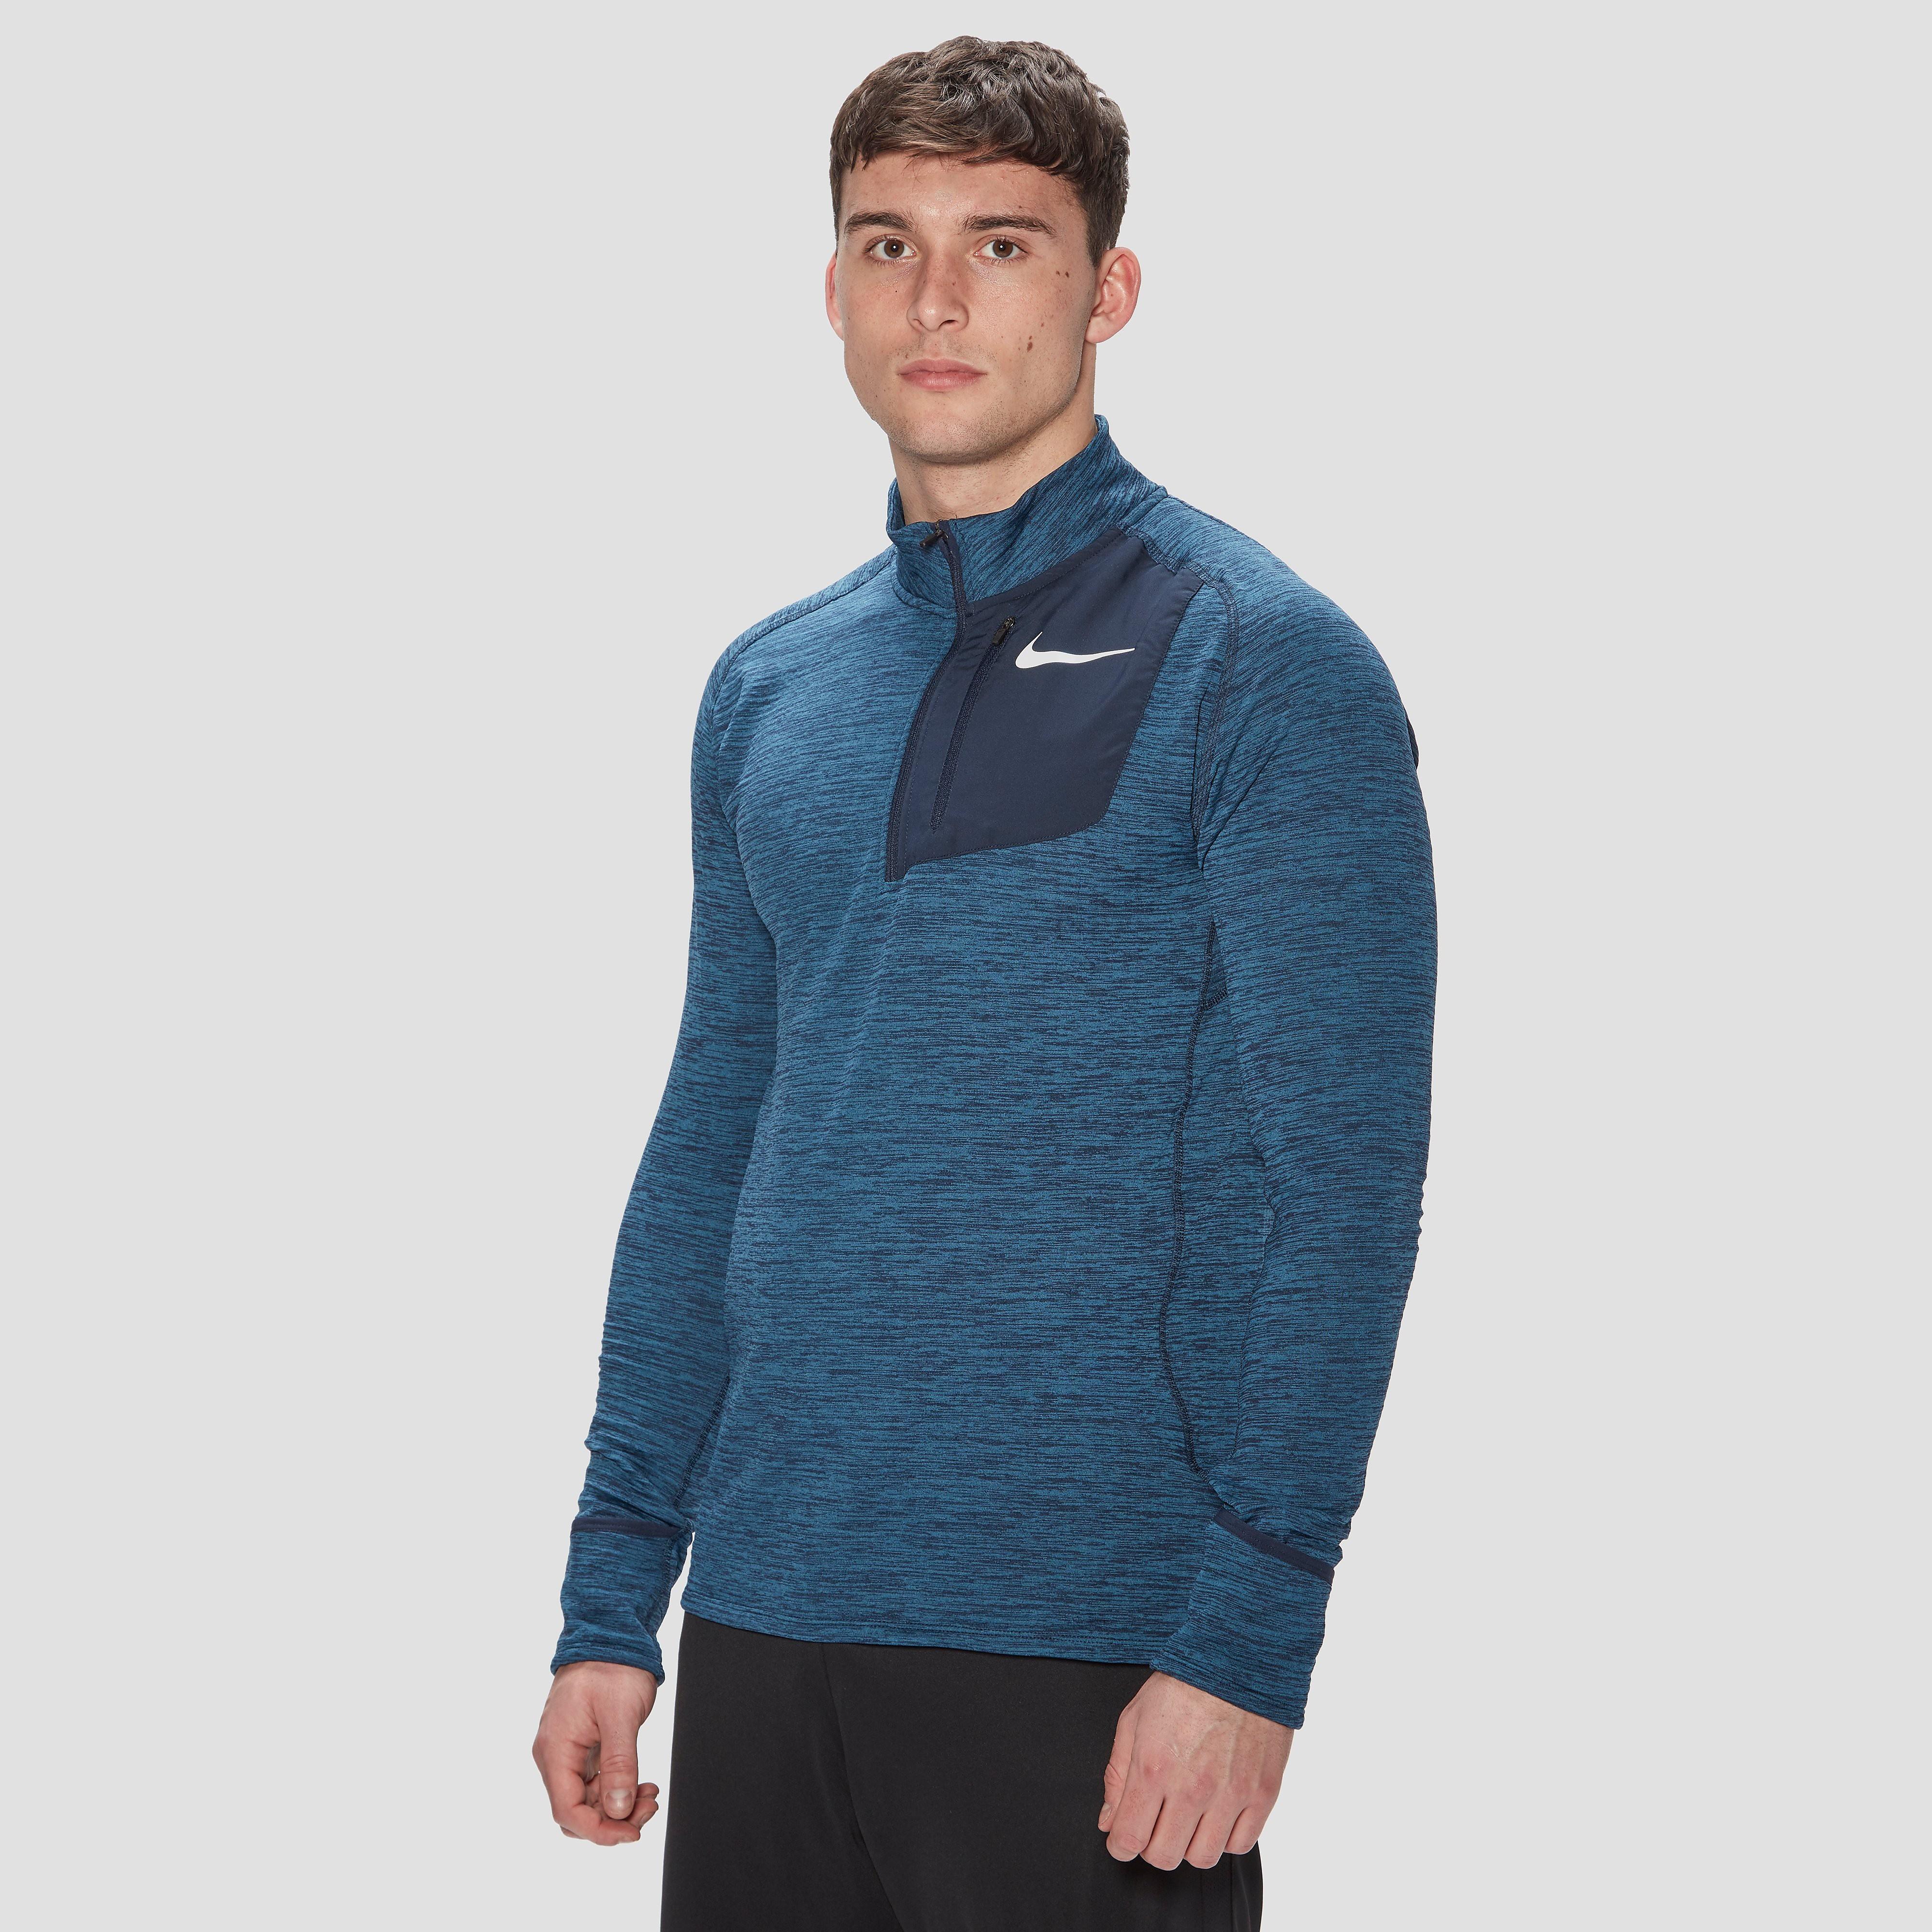 Nike Sphere Element Long Sleeve Men's Running Top